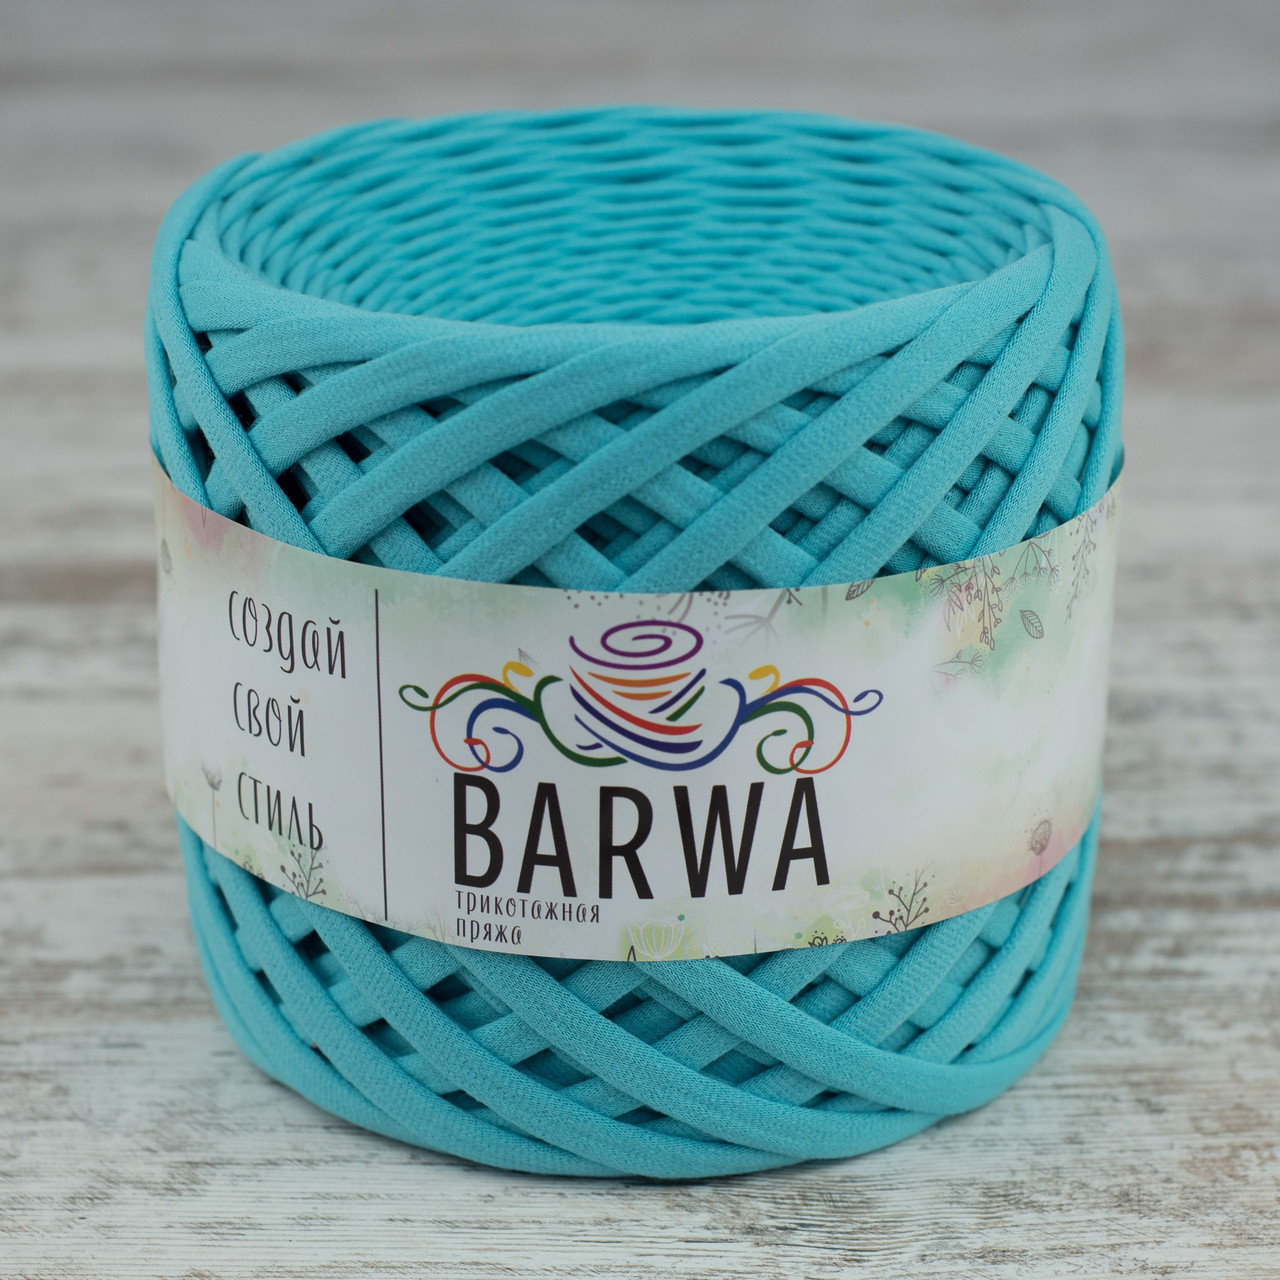 Трикотажная пряжа BARWA standart 7-9 мм, цвет Циан